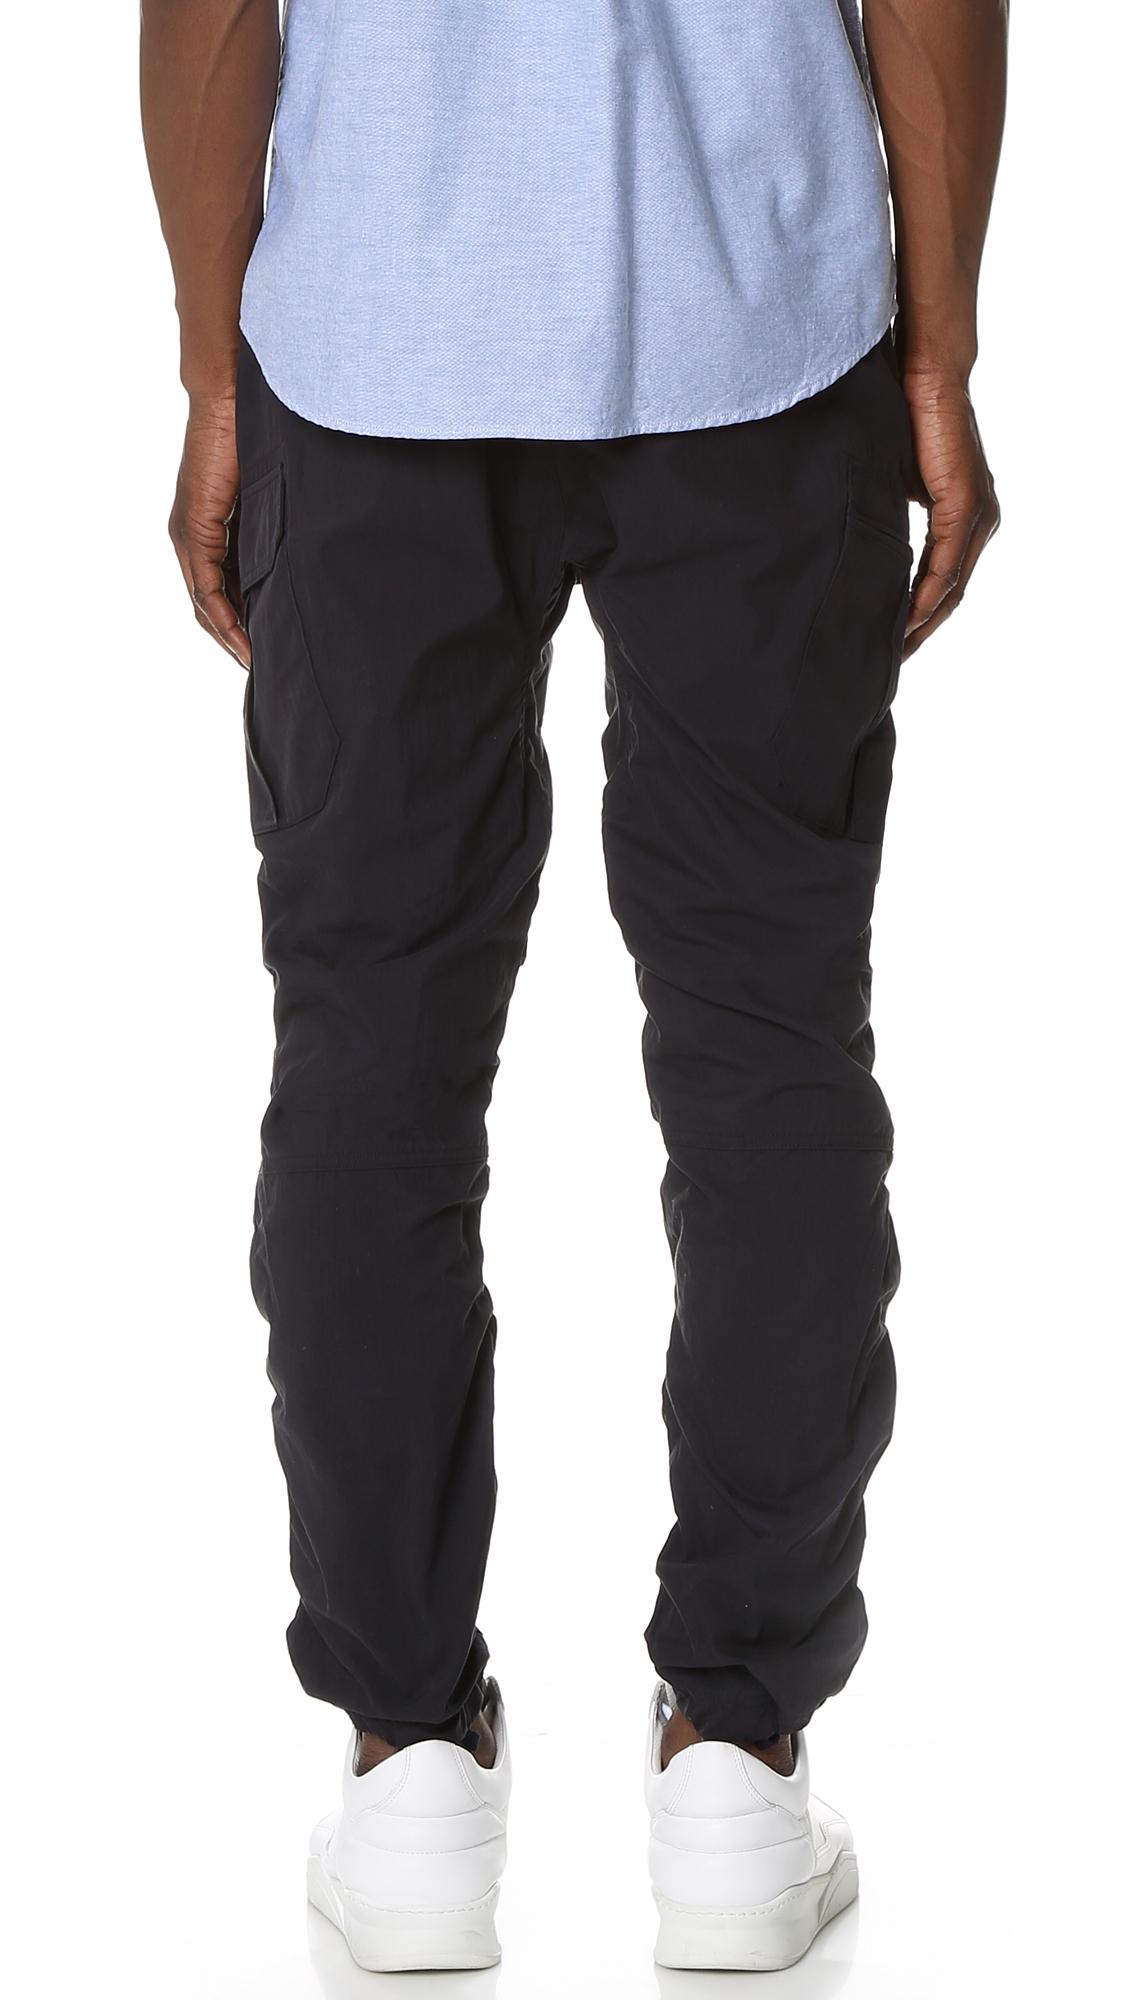 Cotton Nylon Cargo Pants 12